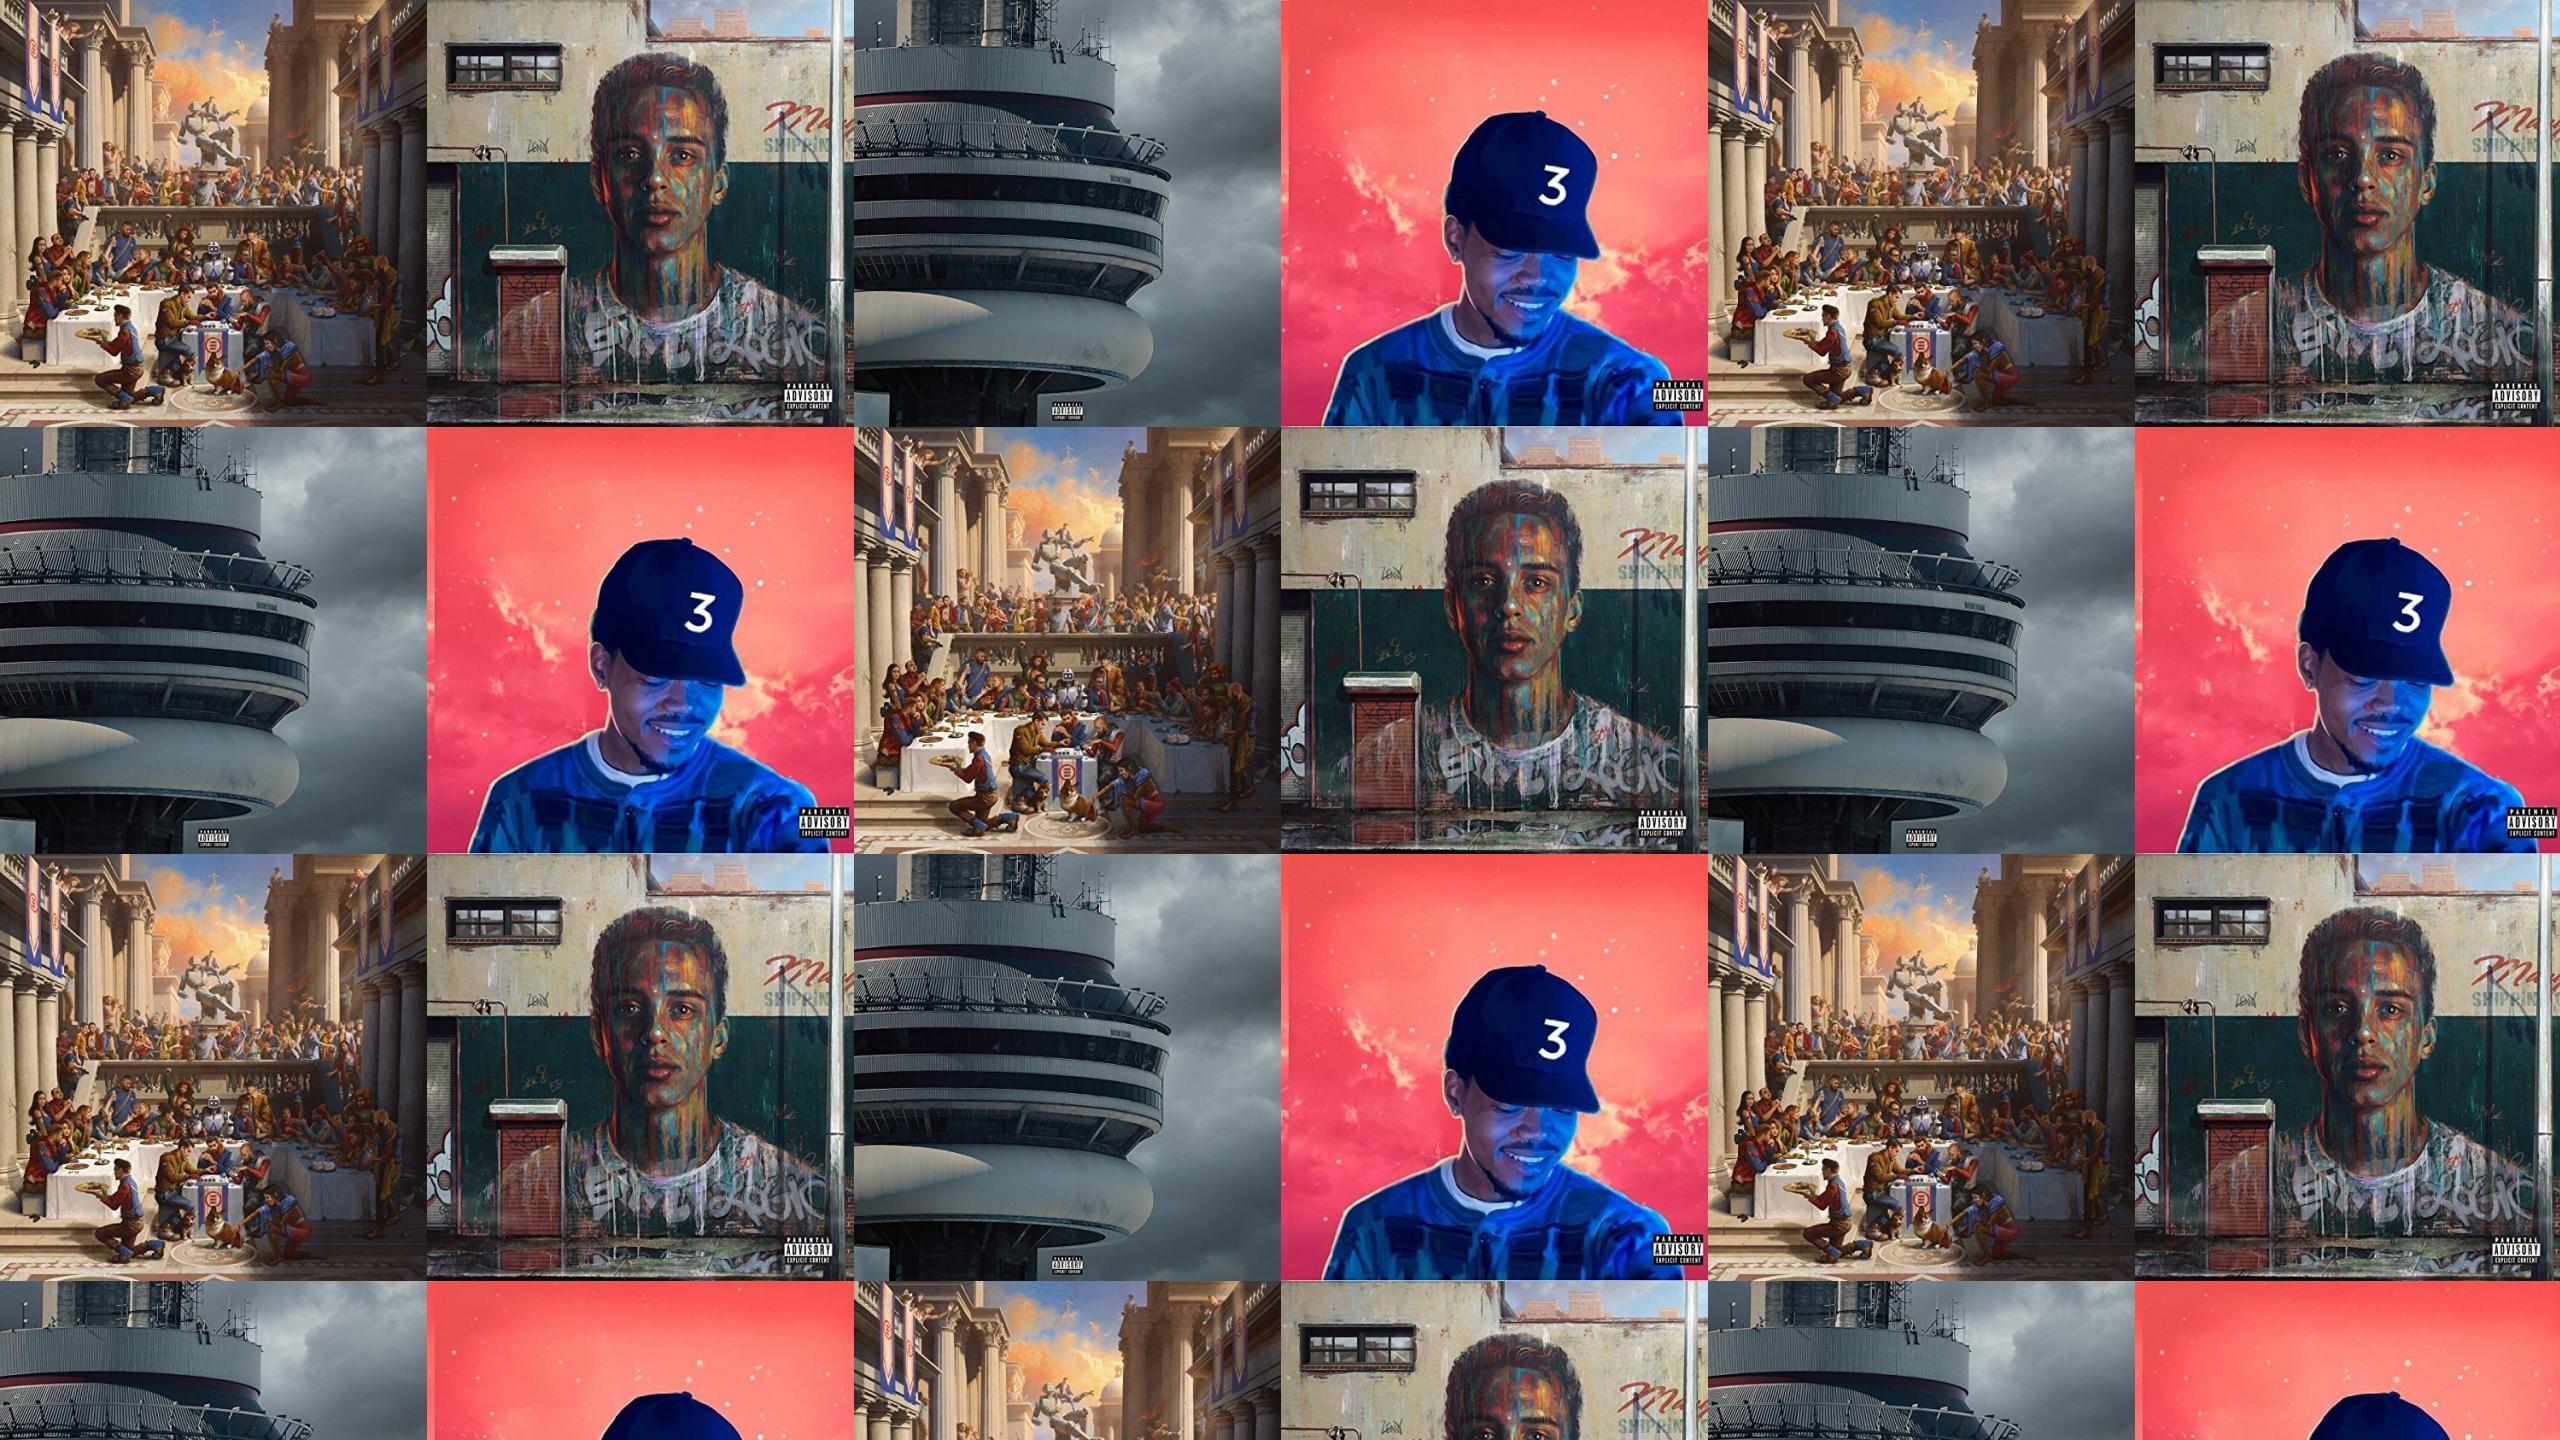 Logic Under Pressure Drake Views Chance Rapper Wallpaper Â« Tiled Desktop  Wallpaper